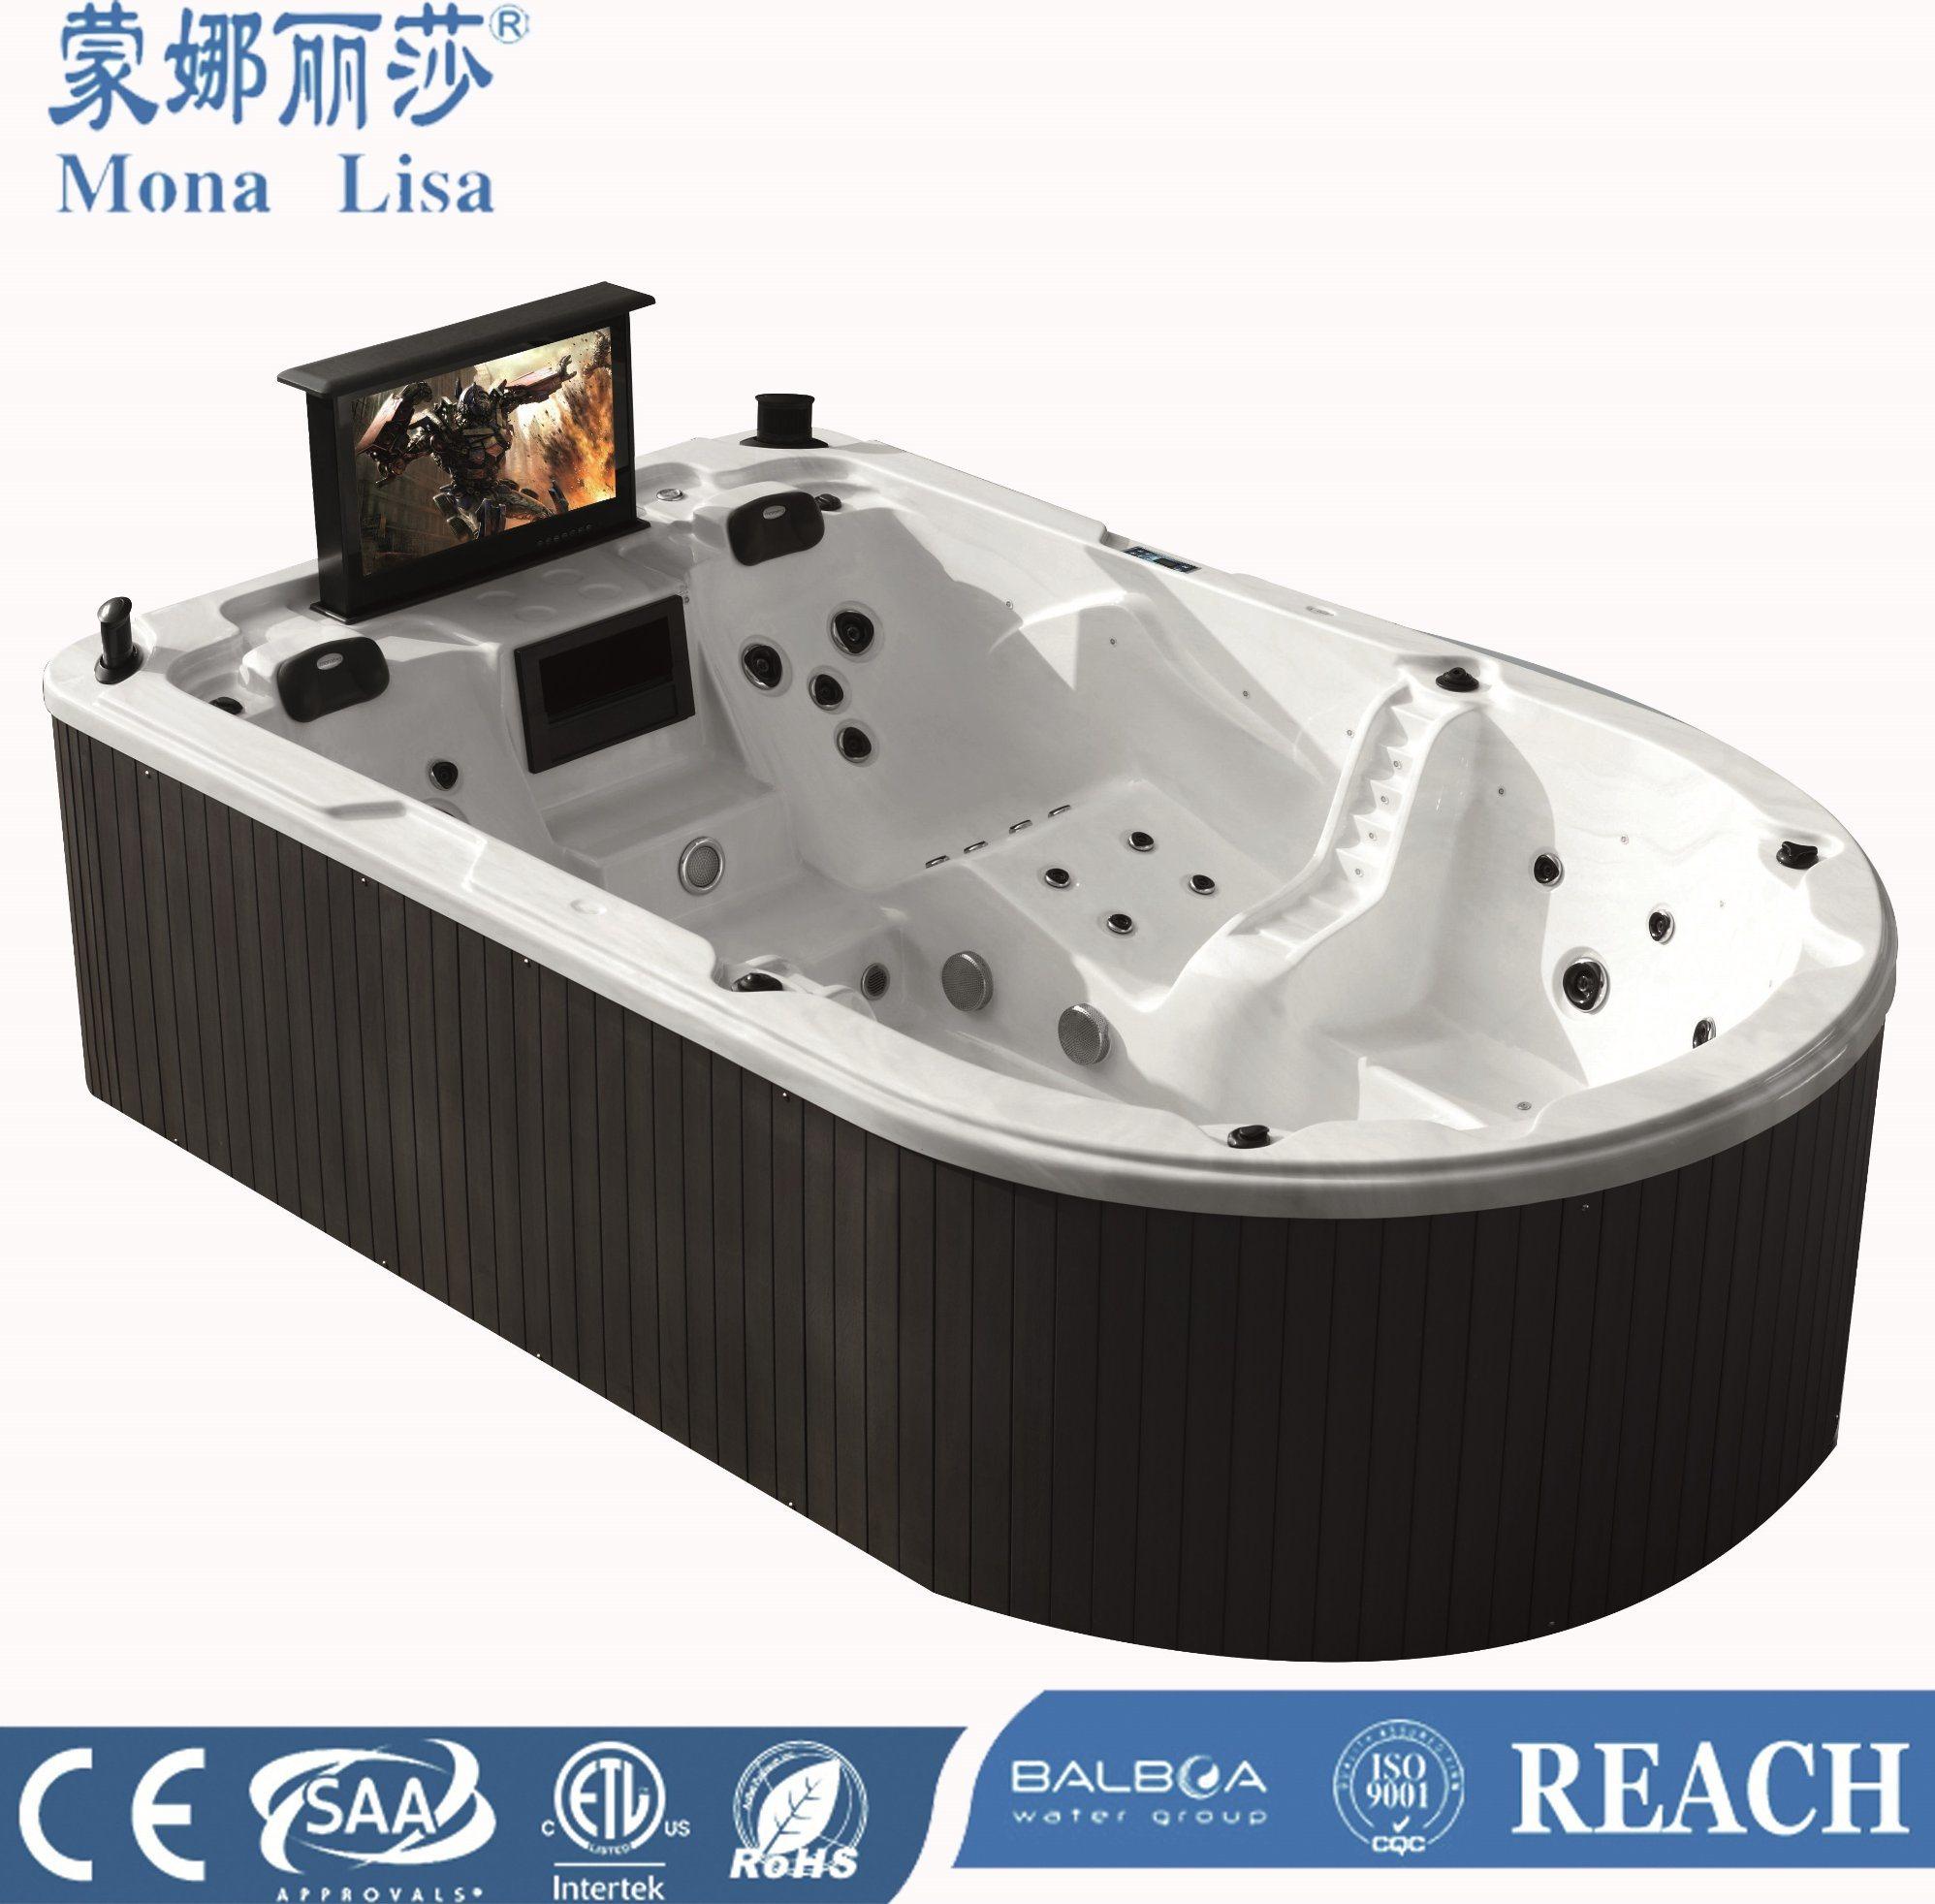 China Monalisa Luxury Ship Shape Whirlpool SPA Jacuzzi with TV (M ...